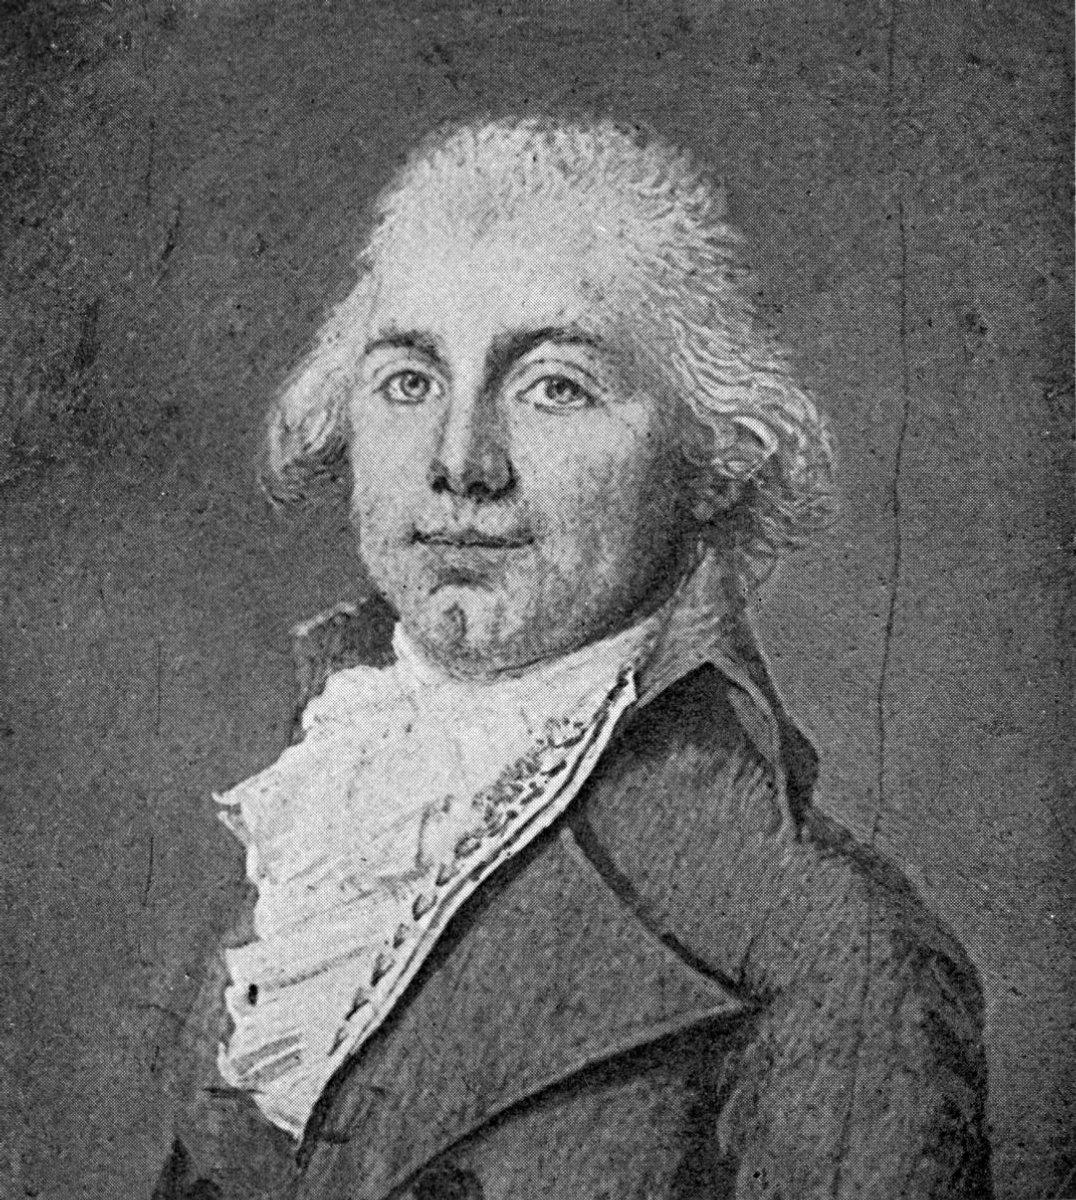 James_Monroe_(1758-1831).jpg